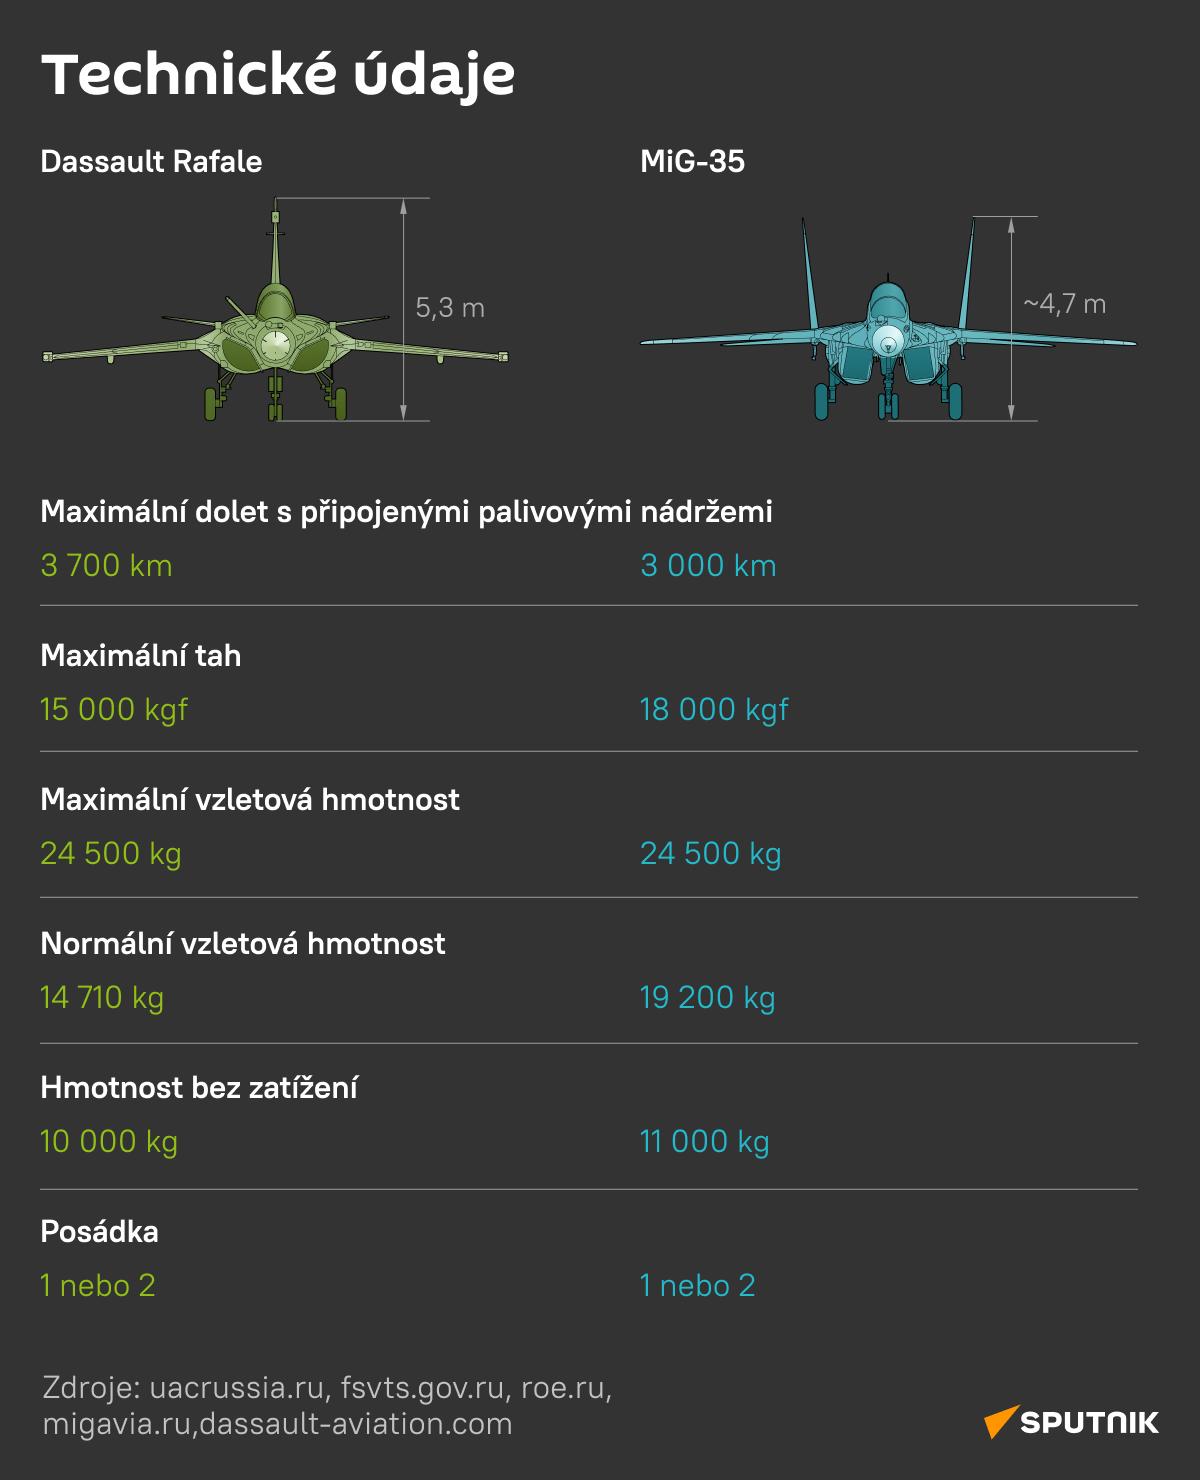 Dassault Rafale versus MiG-35: Technické údaje 2 - Sputnik Česká republika